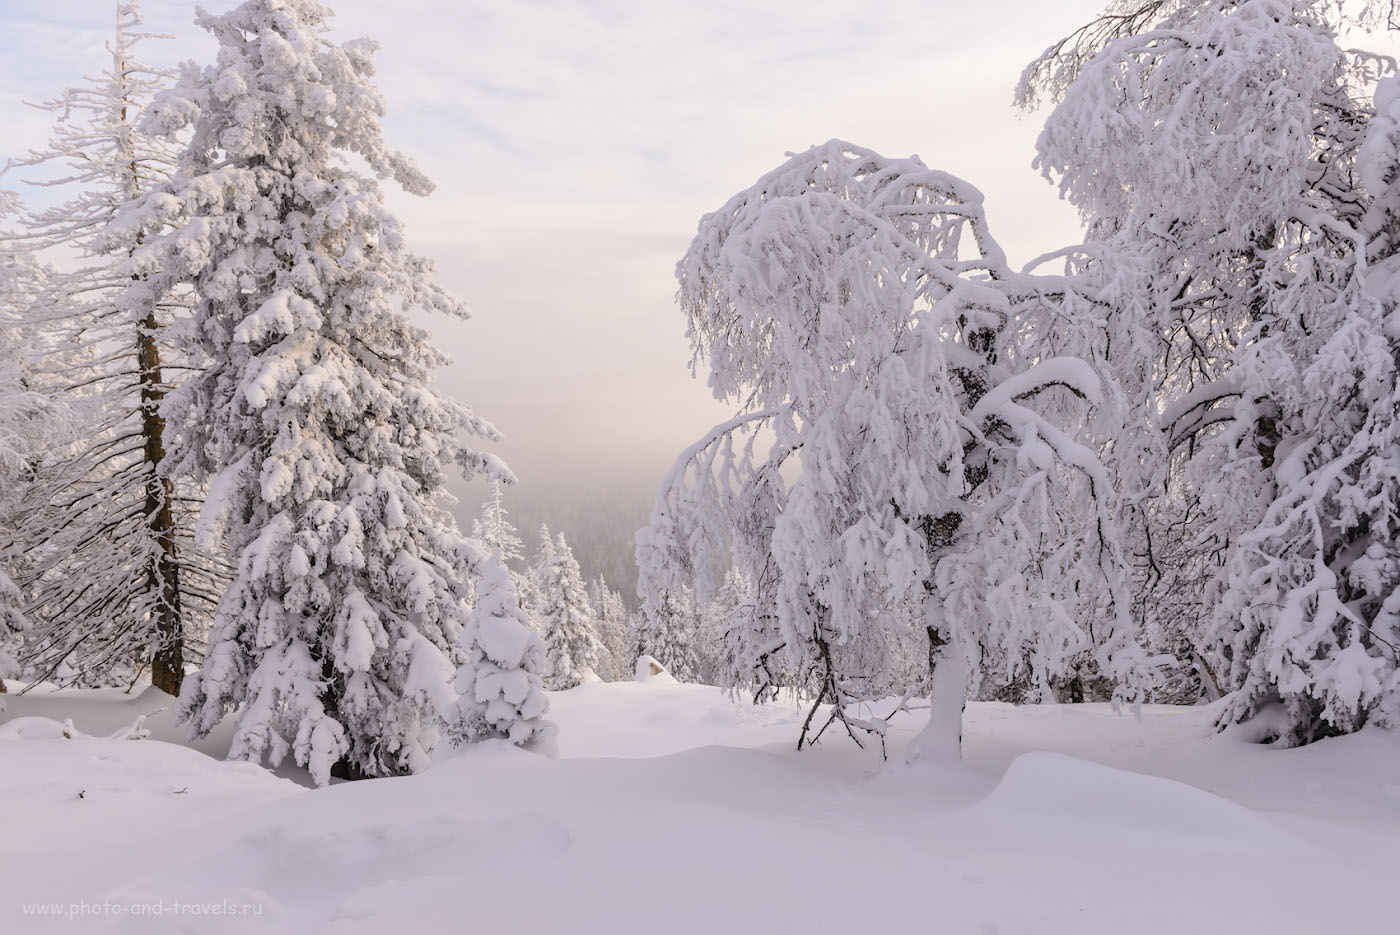 Фото 9. Зима в национальном парке Зюраткуль. 1/160, +0.67, 9.0, 220, 24.